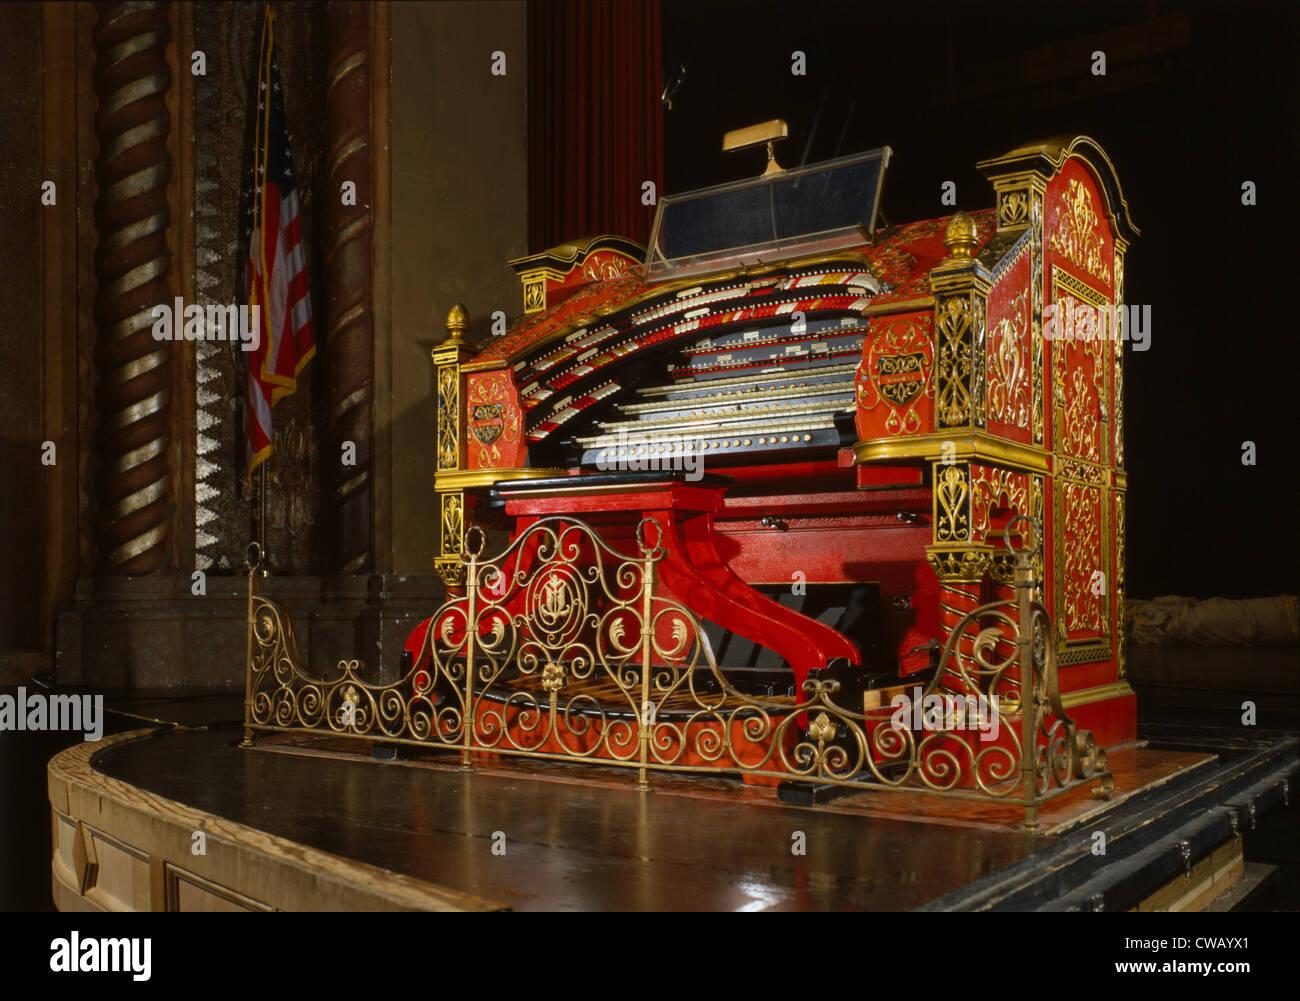 Das Alabama Theater Orgel, Birmingham, Alabama, 1927, Foto ca. 1990er Jahren errichtet. Stockbild